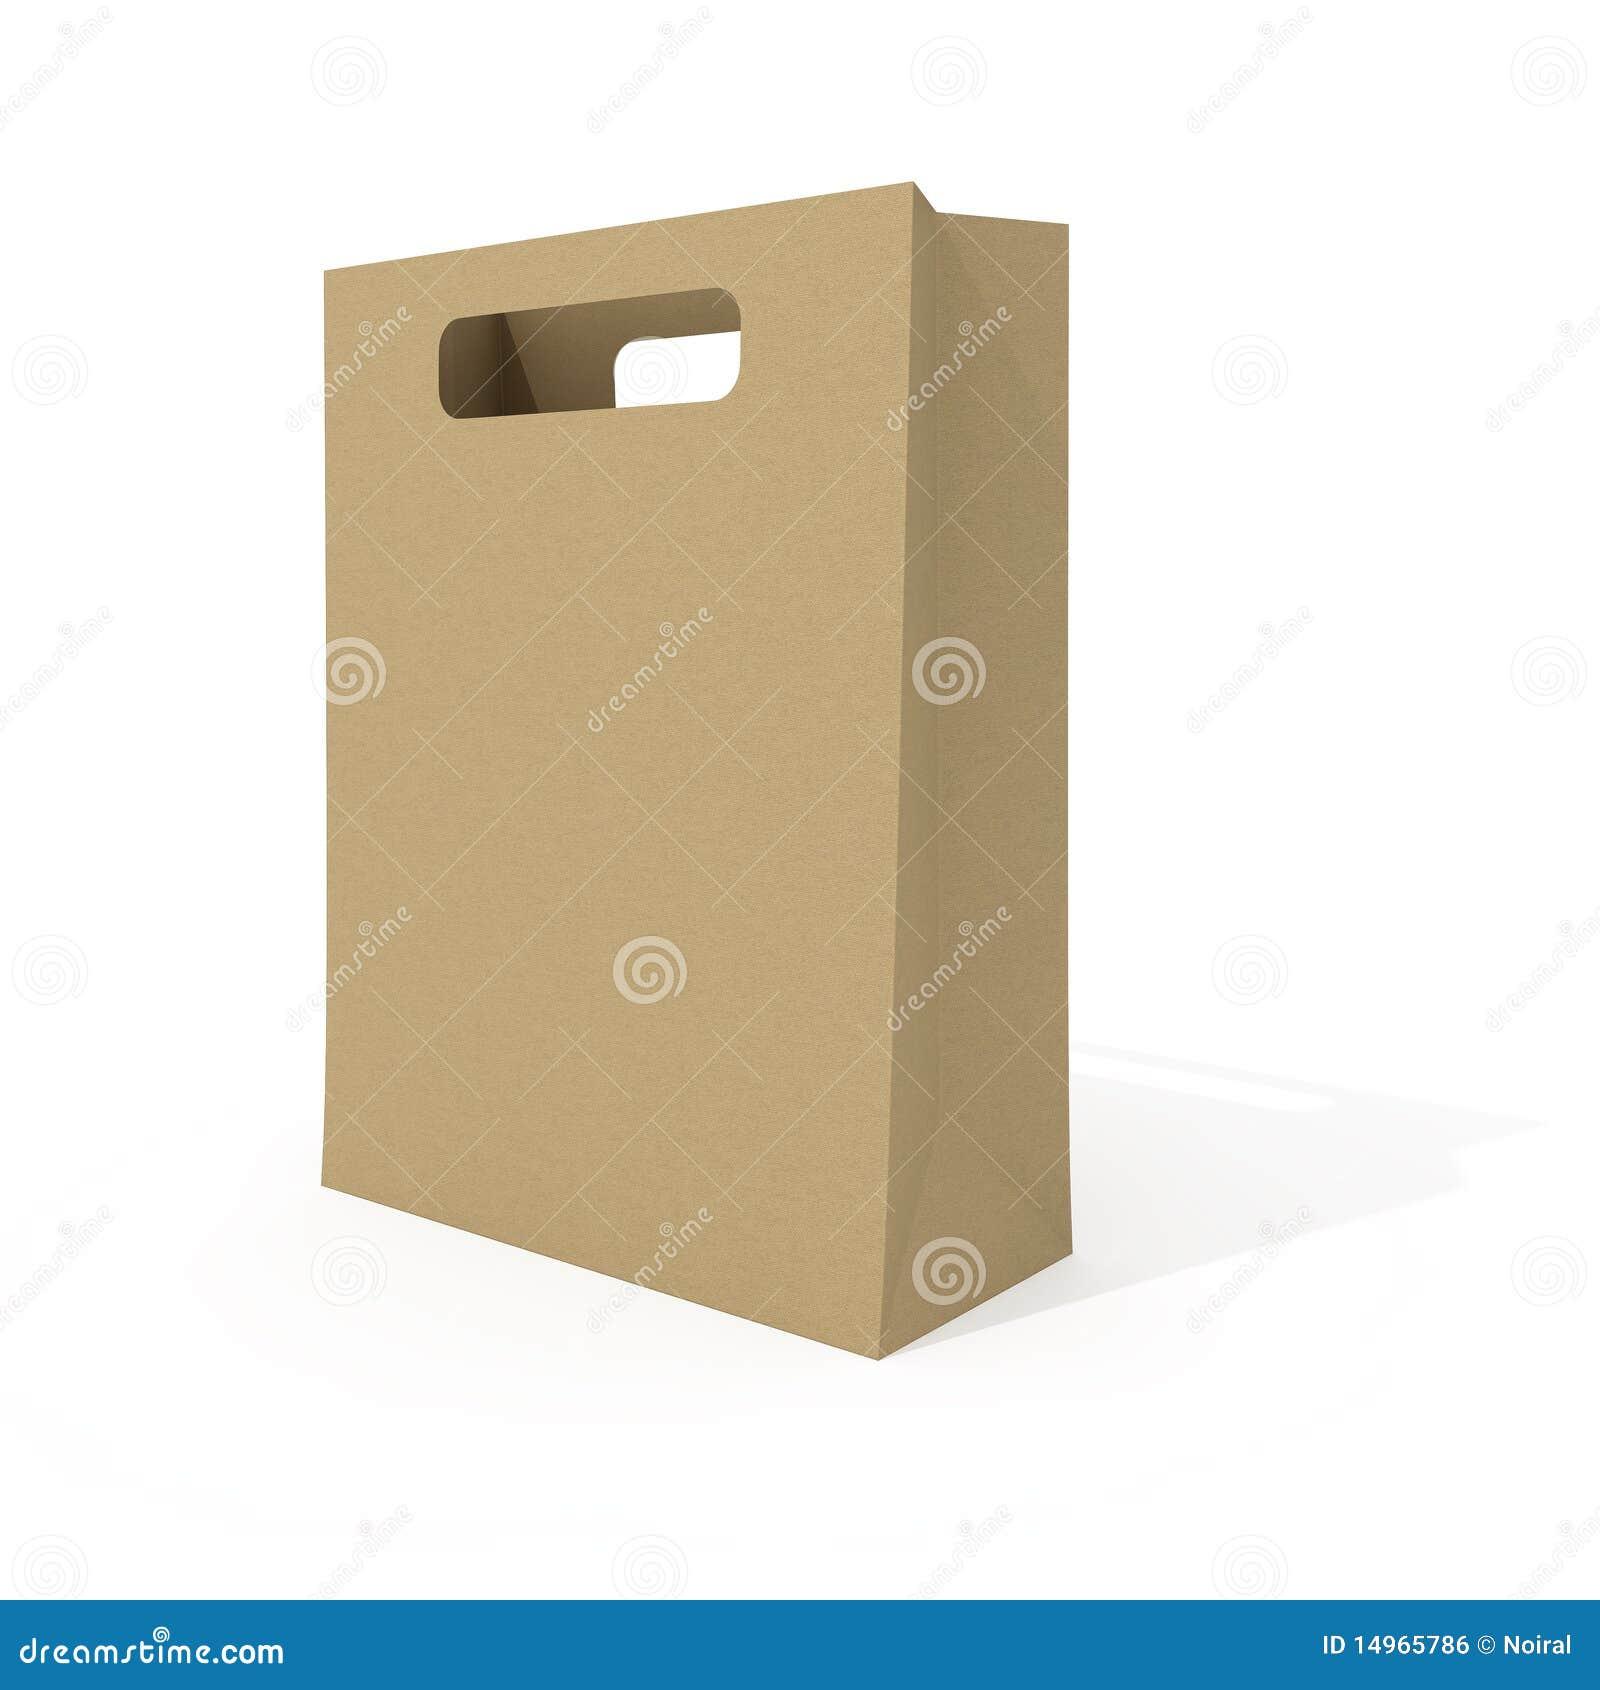 Blank Shopping Bag Royalty Free Stock Image - Image: 14965786